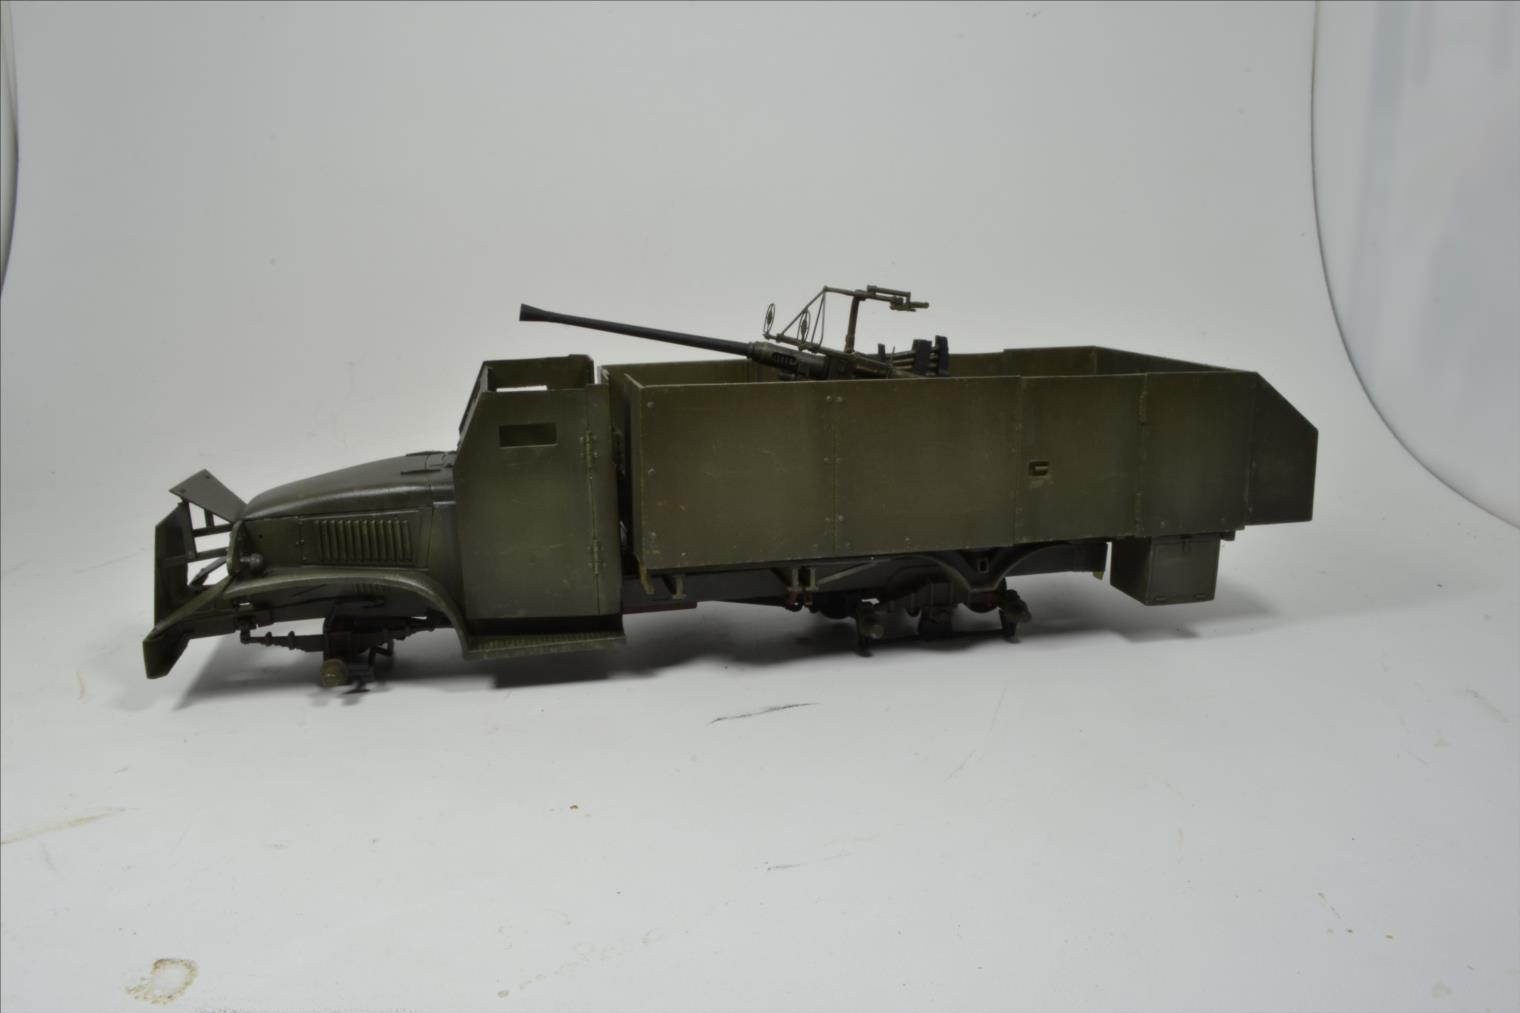 INDOCHINE GMC Bofors (Hobby Boss) 1/35 - Page 2 19122109484822494216568051